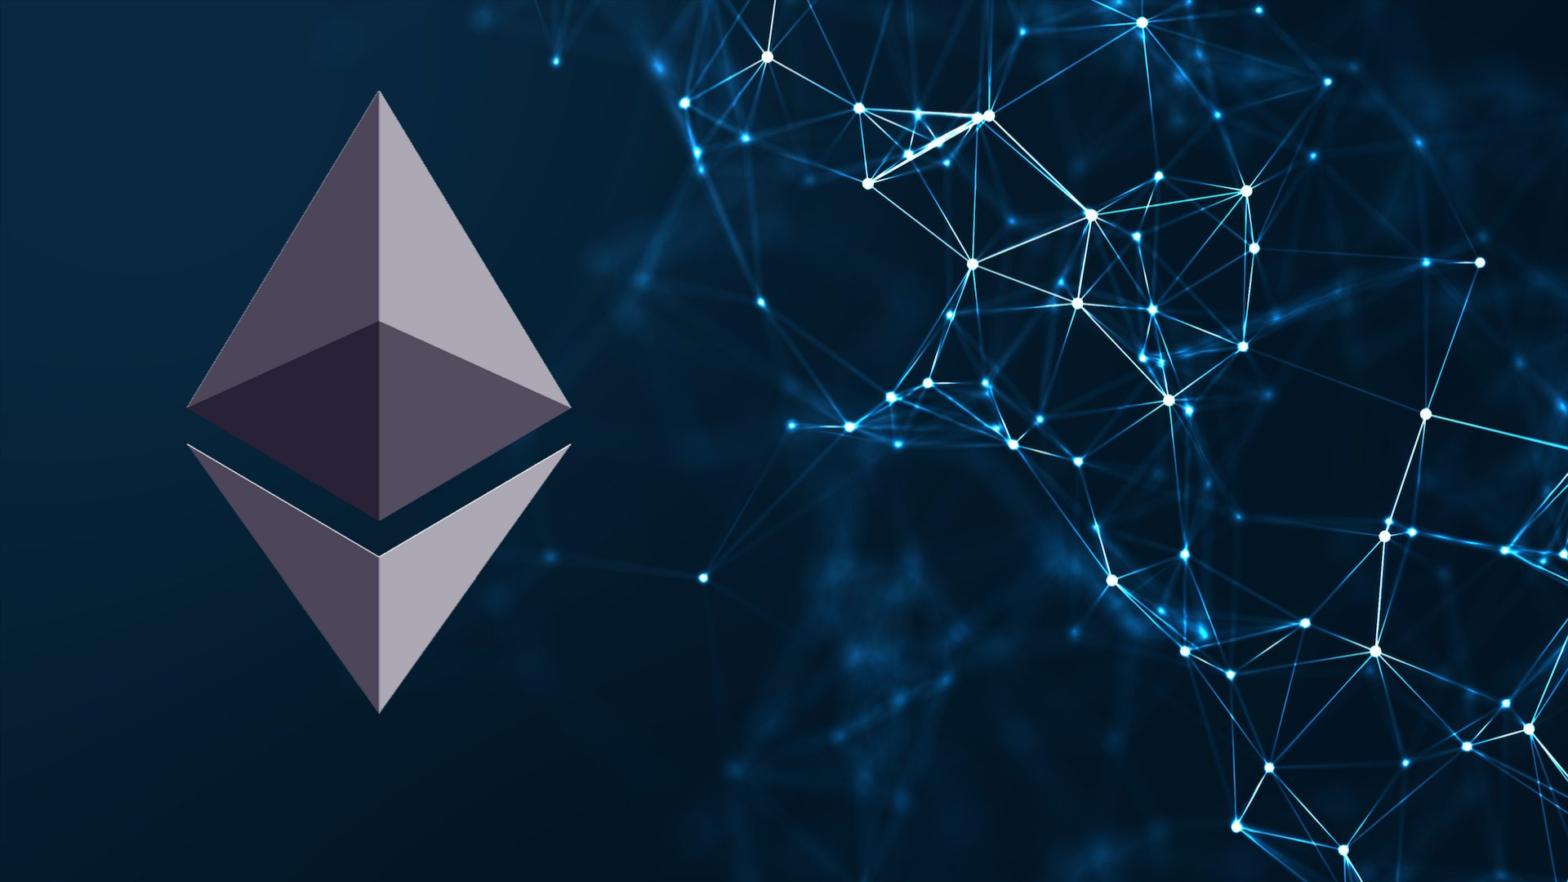 Ethereum (ETH) Price Prediction